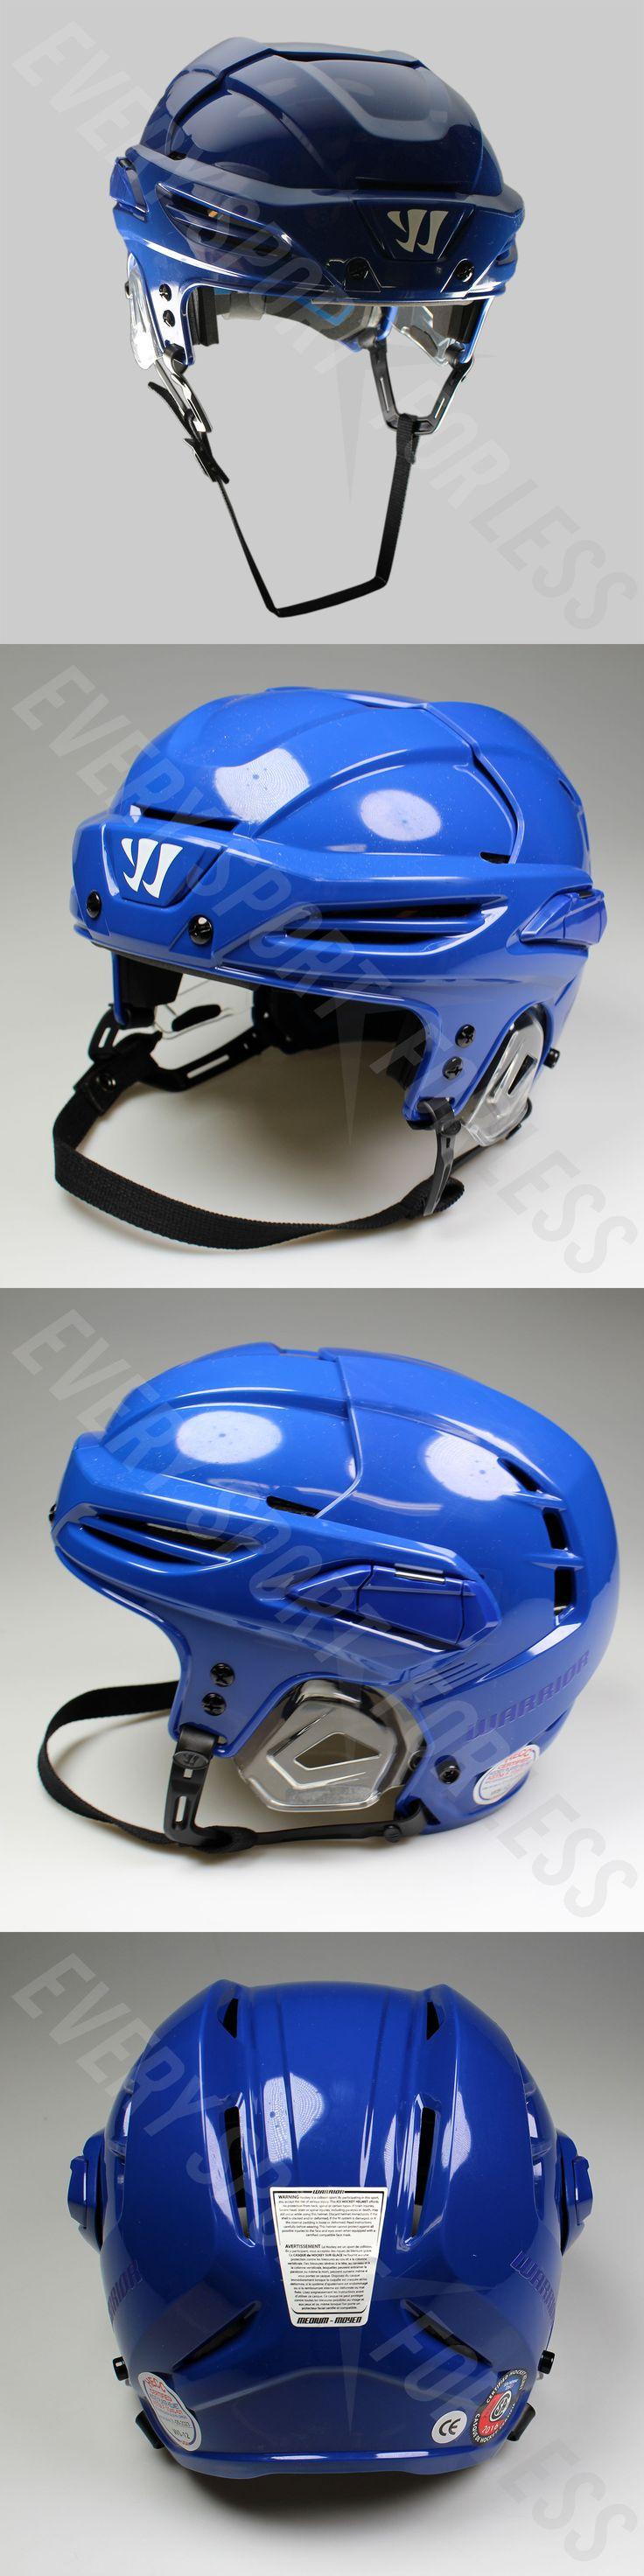 Helmets 20854: Warrior Sports Adult Covert Px+ Hockey Helmet Pxph6 - Royal (New) -> BUY IT NOW ONLY: $179.99 on eBay!